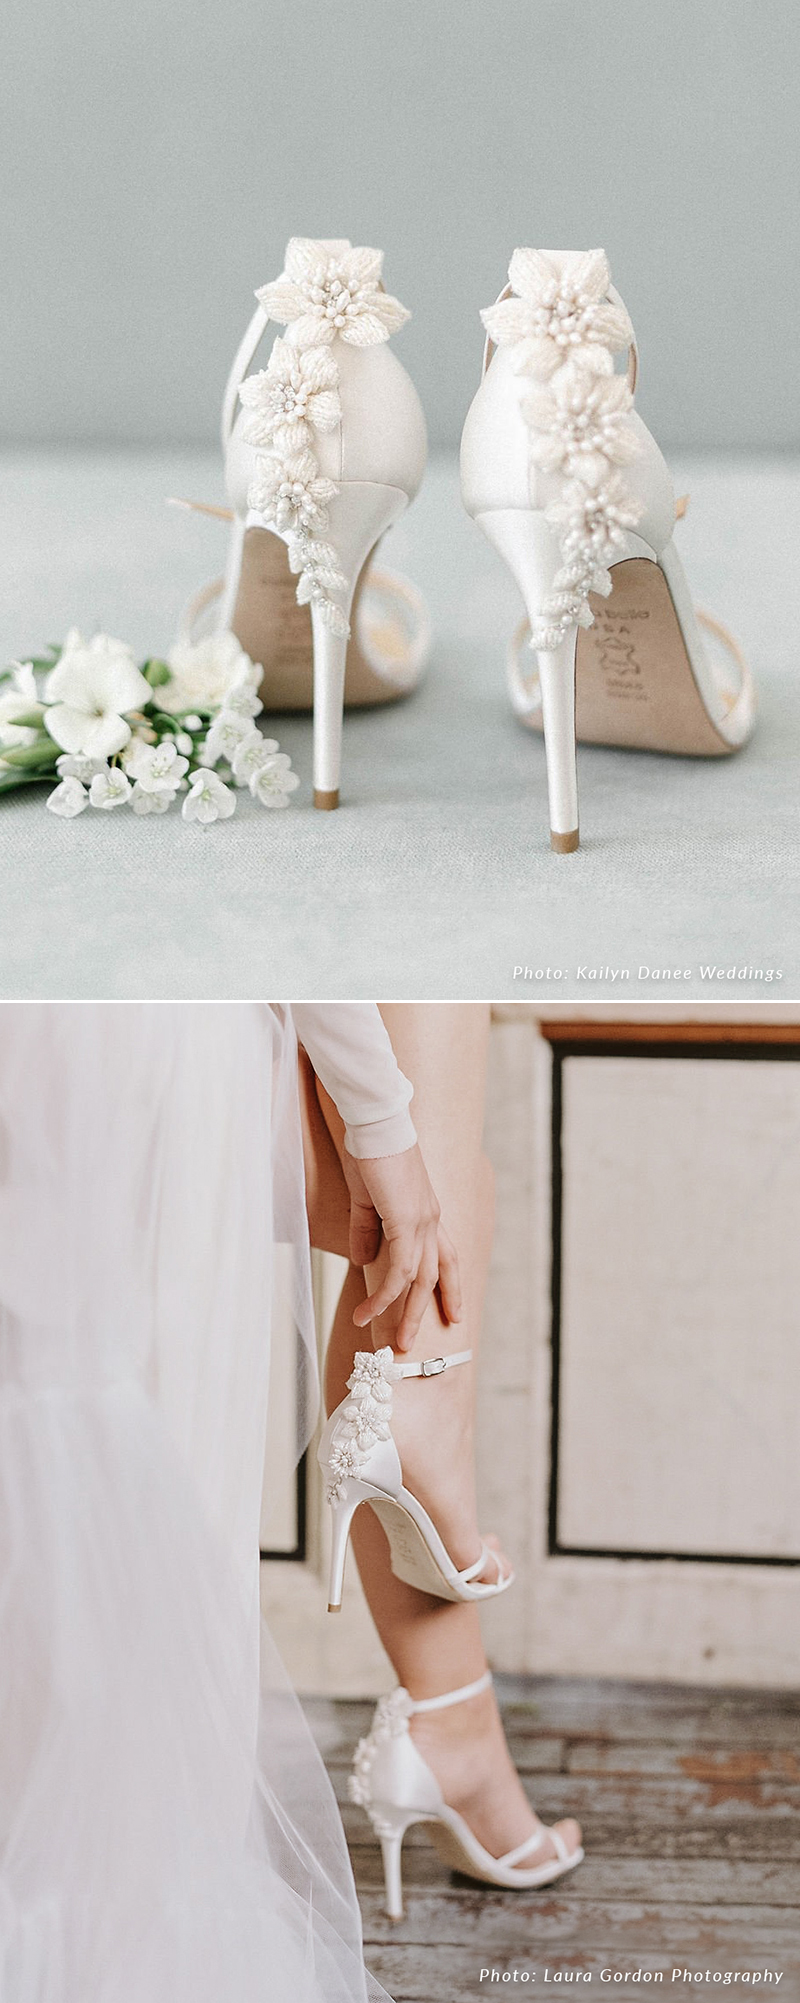 3D Floral Pearls Wedding Heel